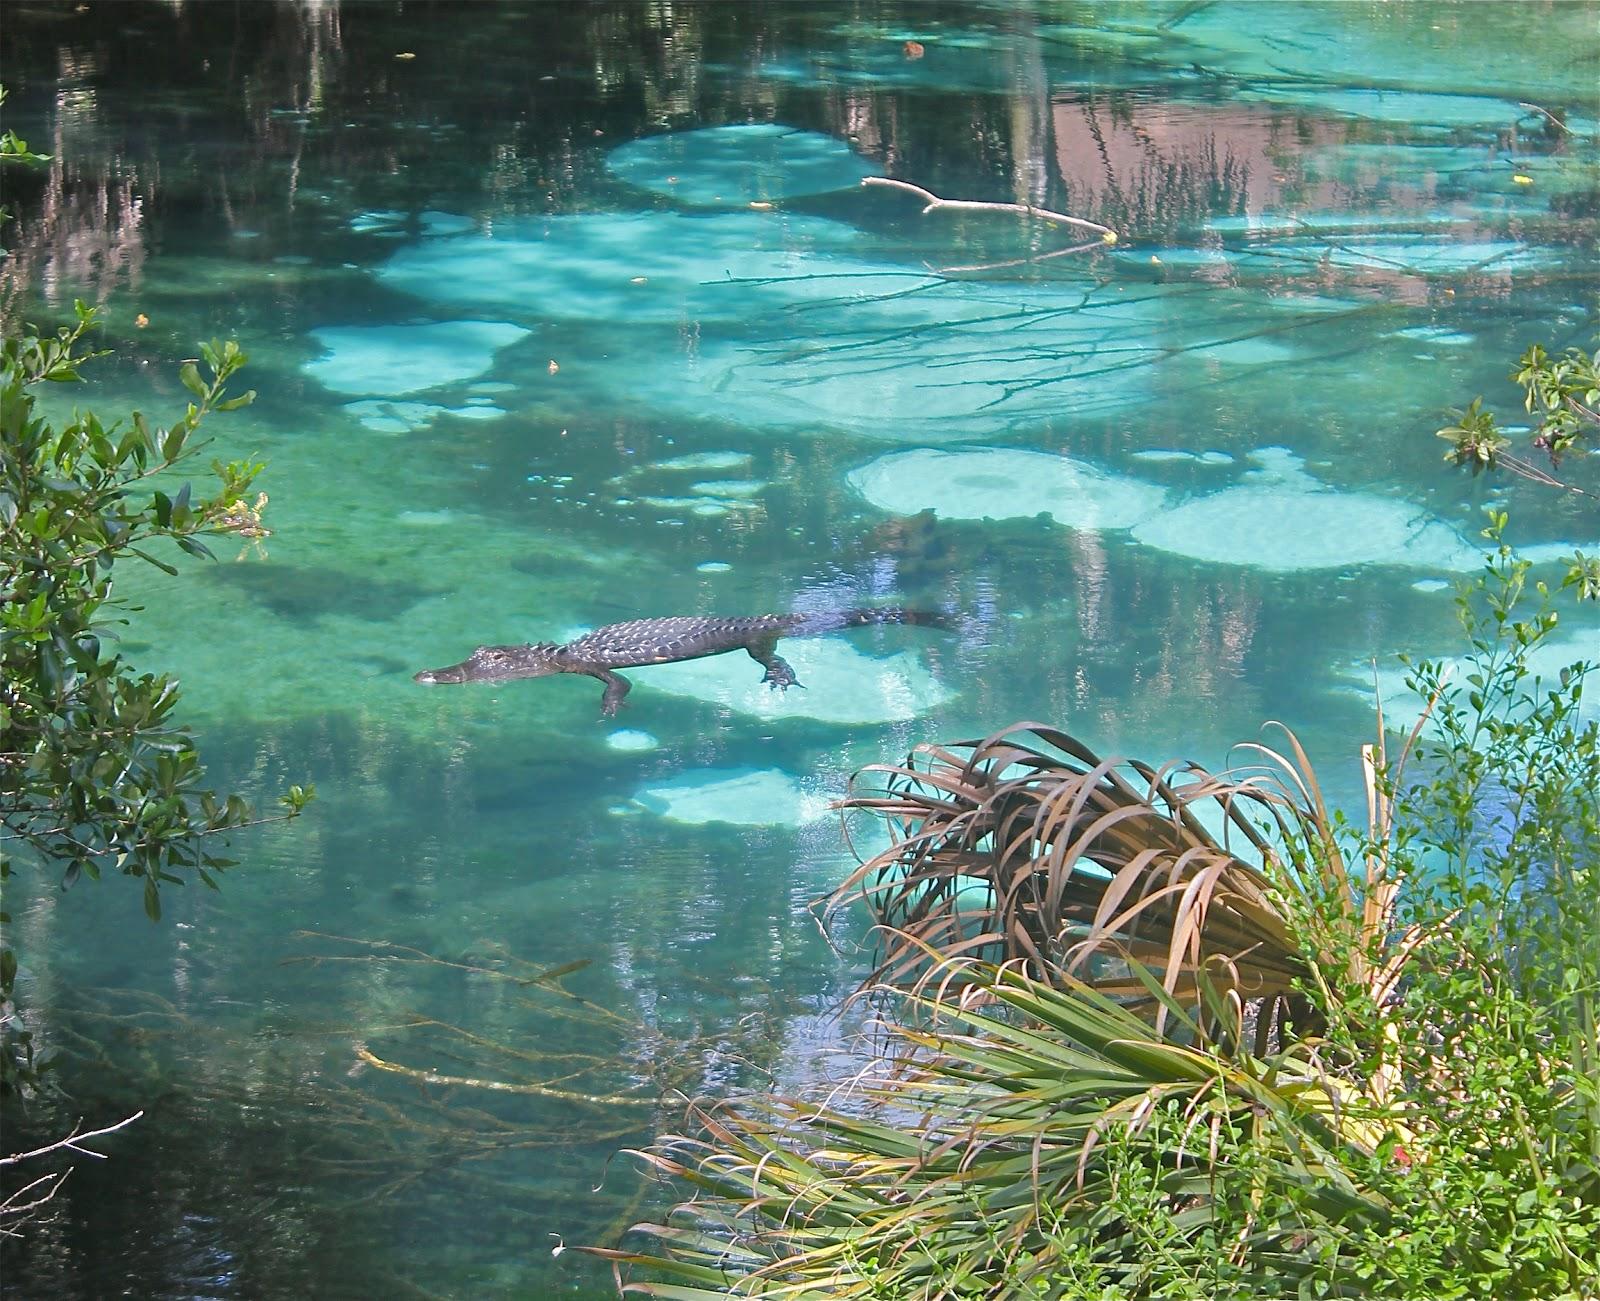 florida u0027s threatened springs florida u0027s threatened springs   phillip u0027s natural world  rh   majikphil blogspot